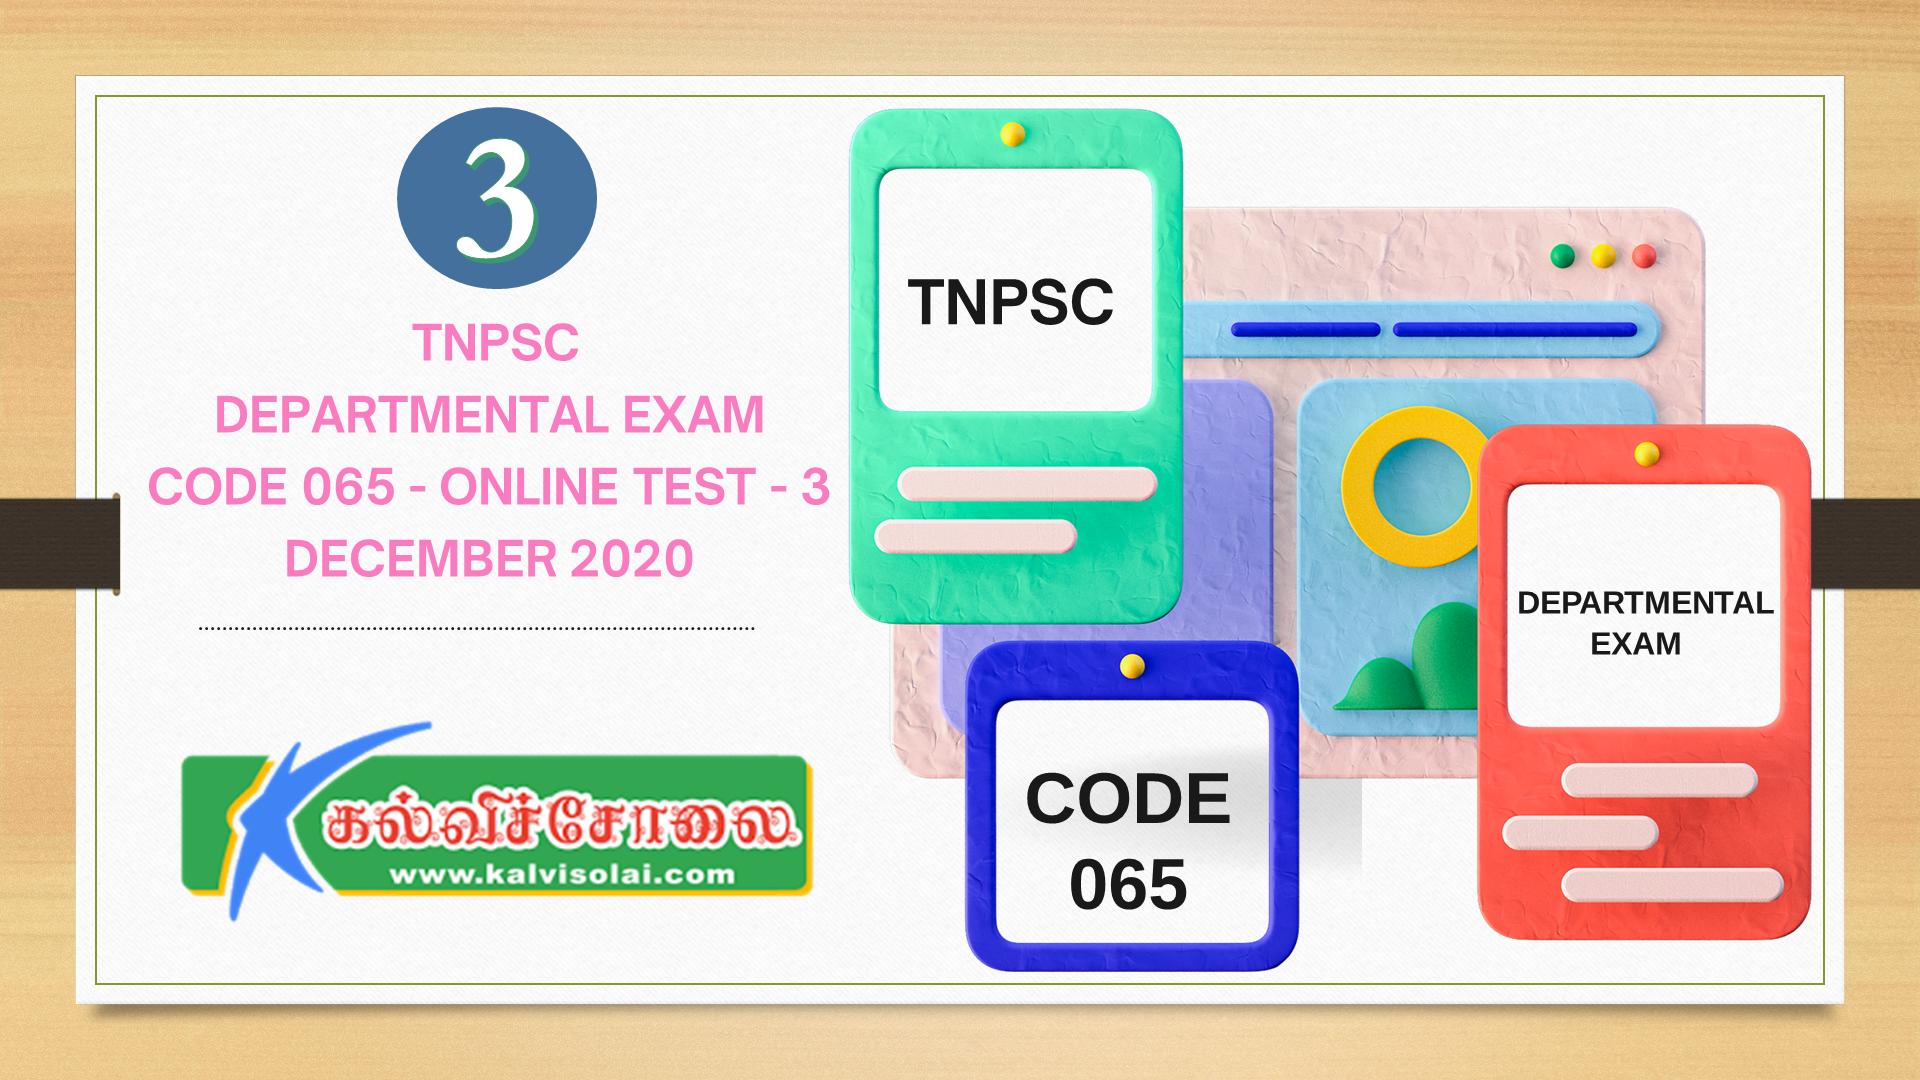 kalvisolai-kalviseihi-padasalai-kalvikural-kaninikkalvi-TNPSC DEPARTMENTAL EXAM - CODE 065 - ONLINE TEST - 3